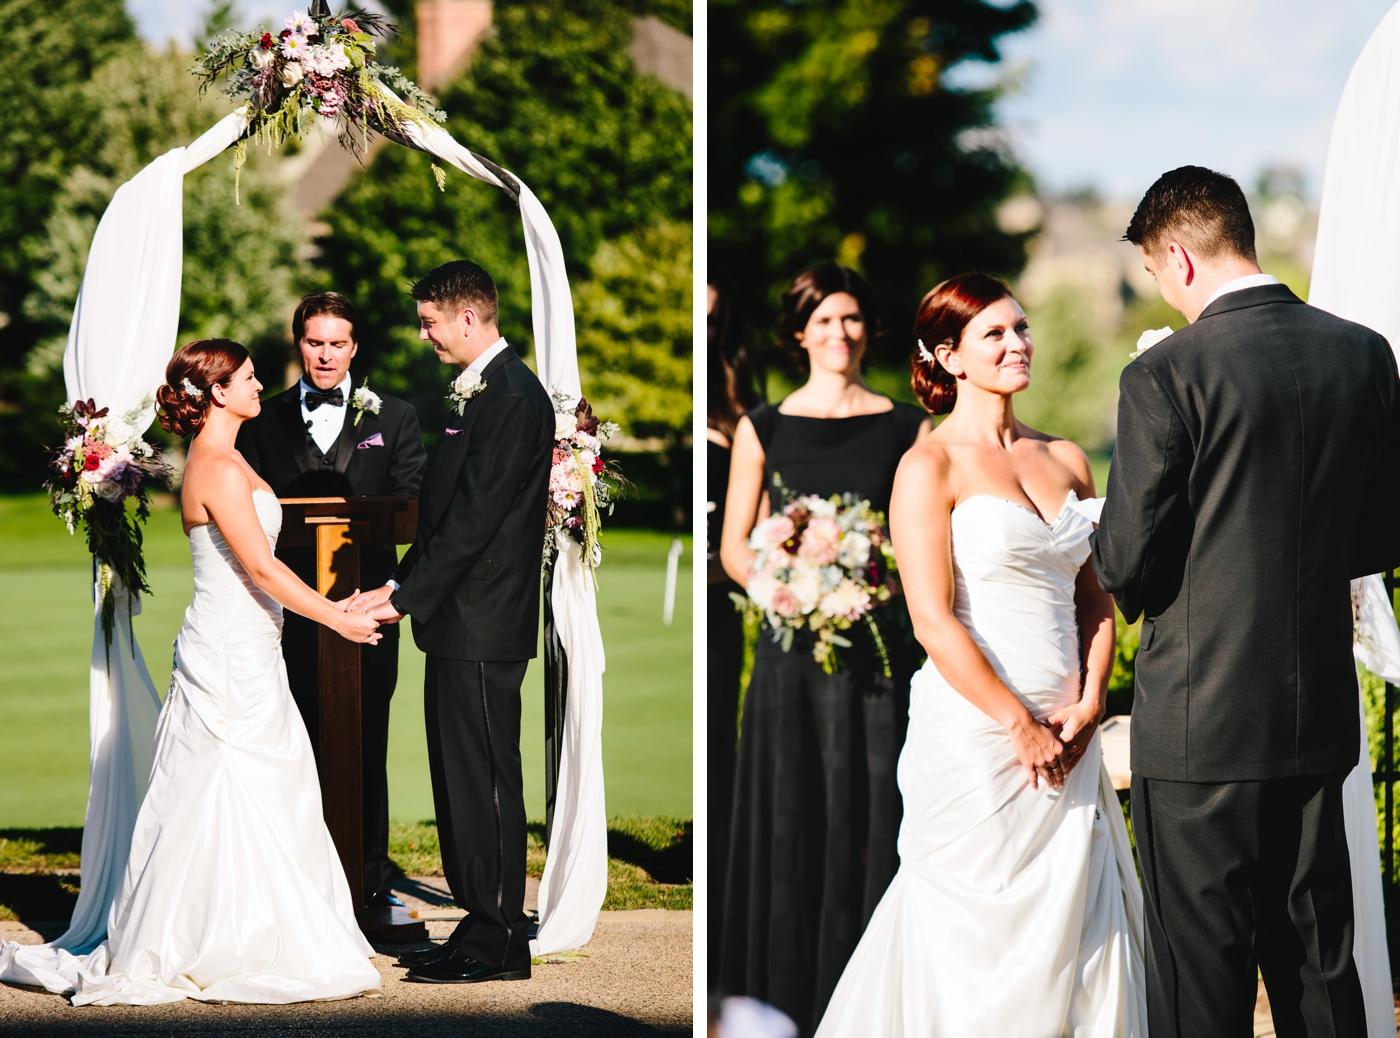 chicago-fine-art-wedding-photography-friel20